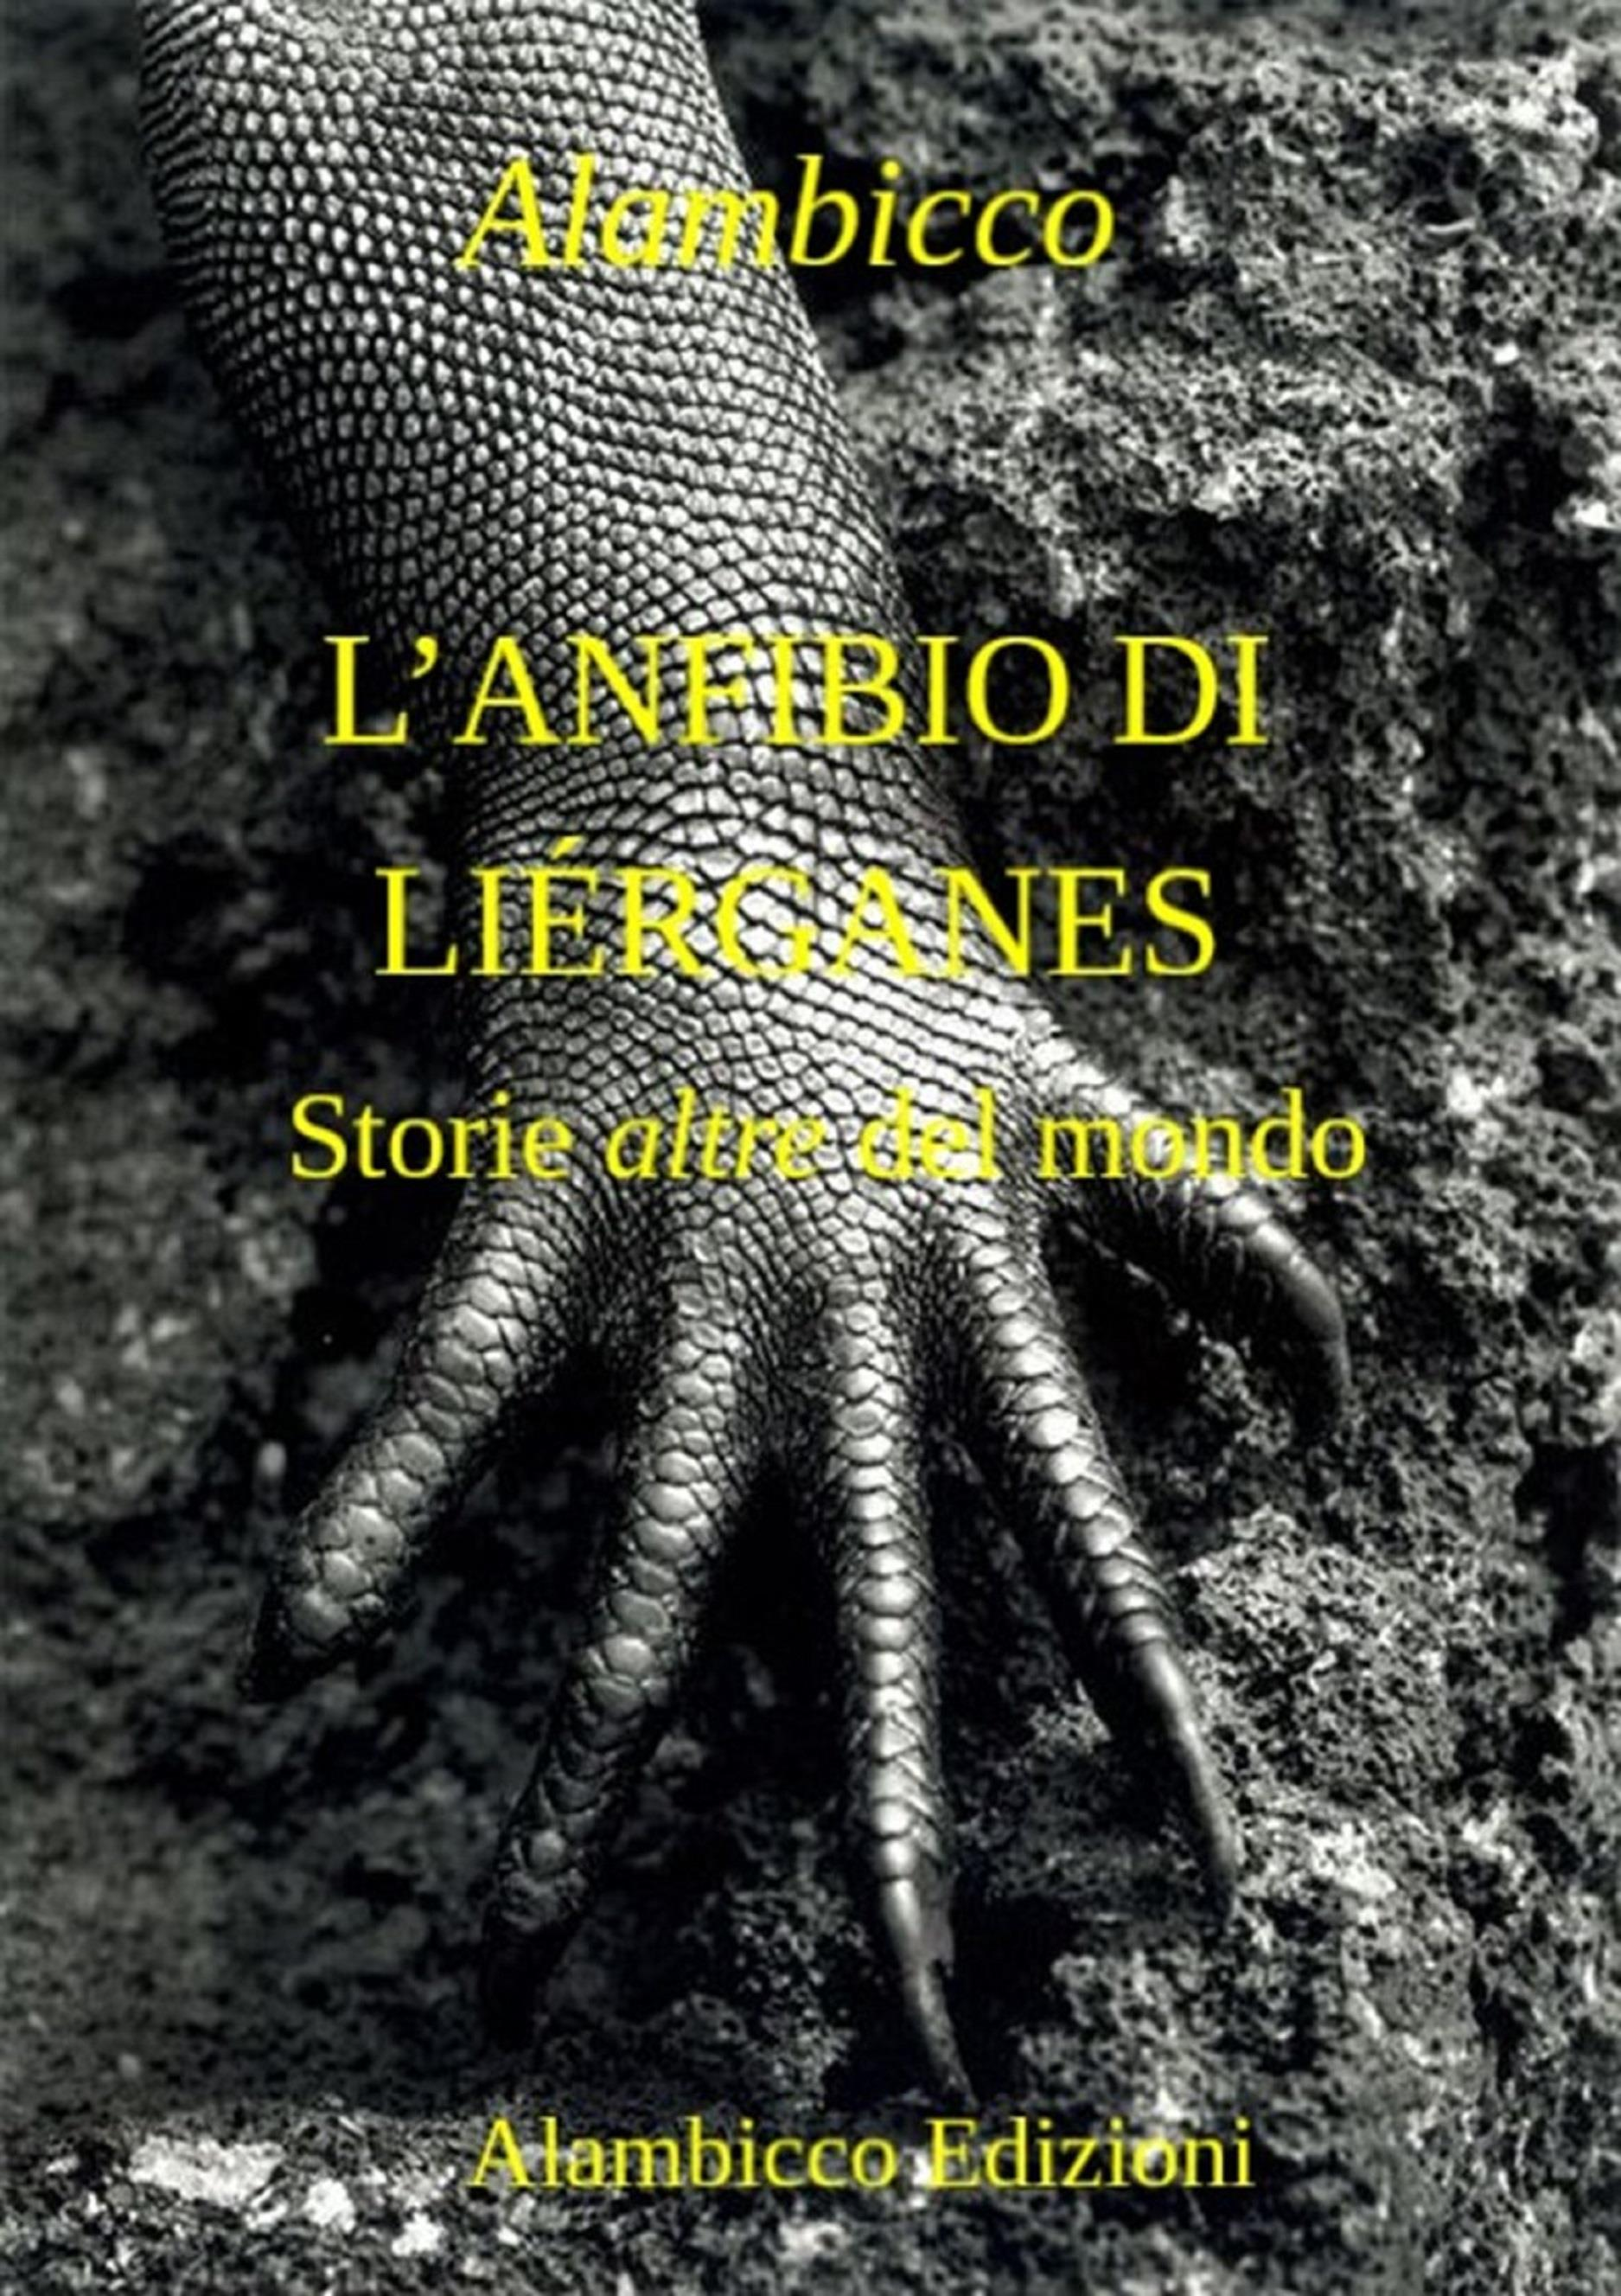 L'anfibio di Liérganes